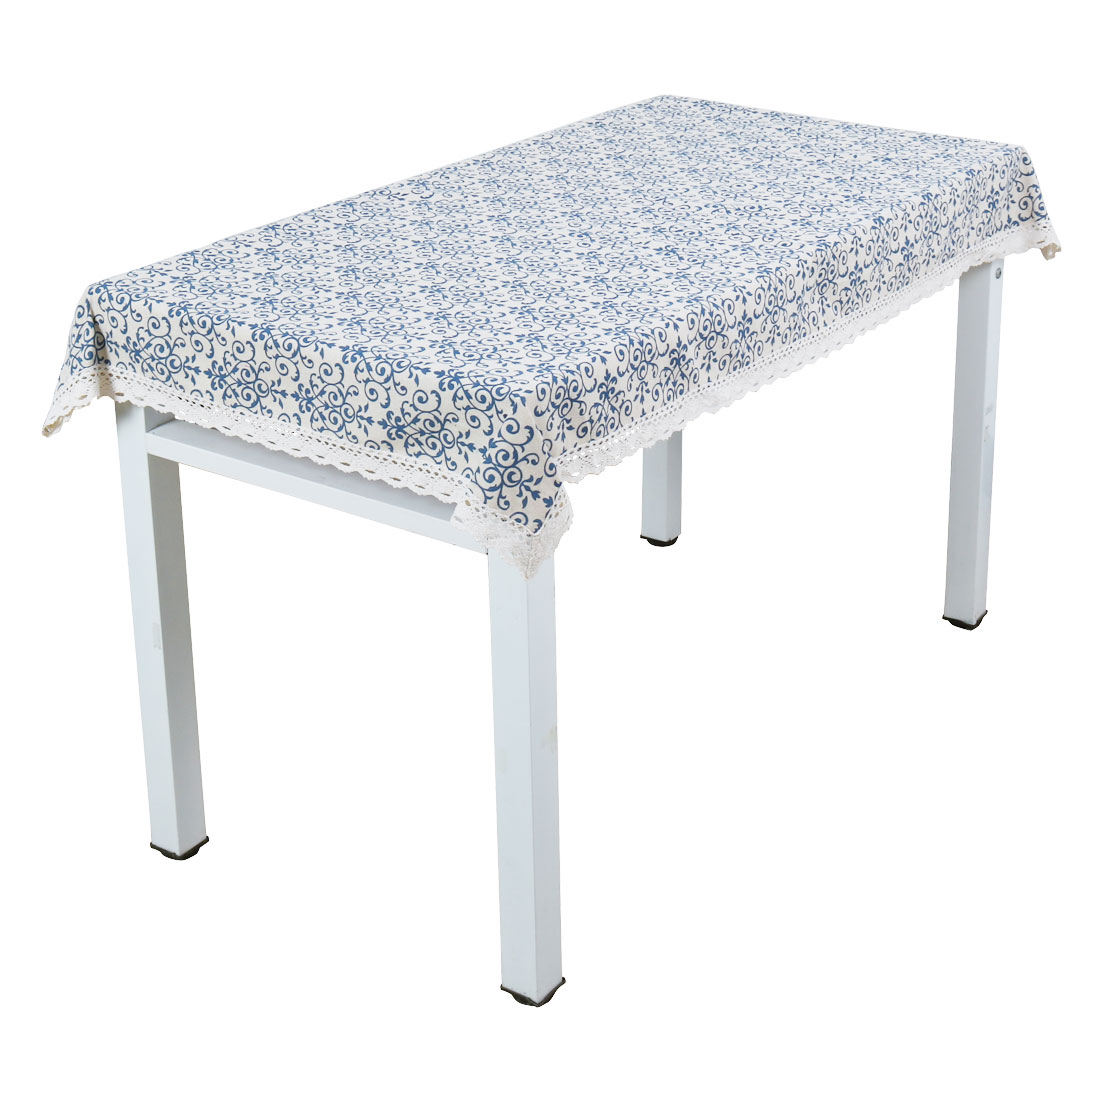 Vintage Navy Damask Pattern Lace Tablecloth Cotton Linen Table Cover 140 x 140cm